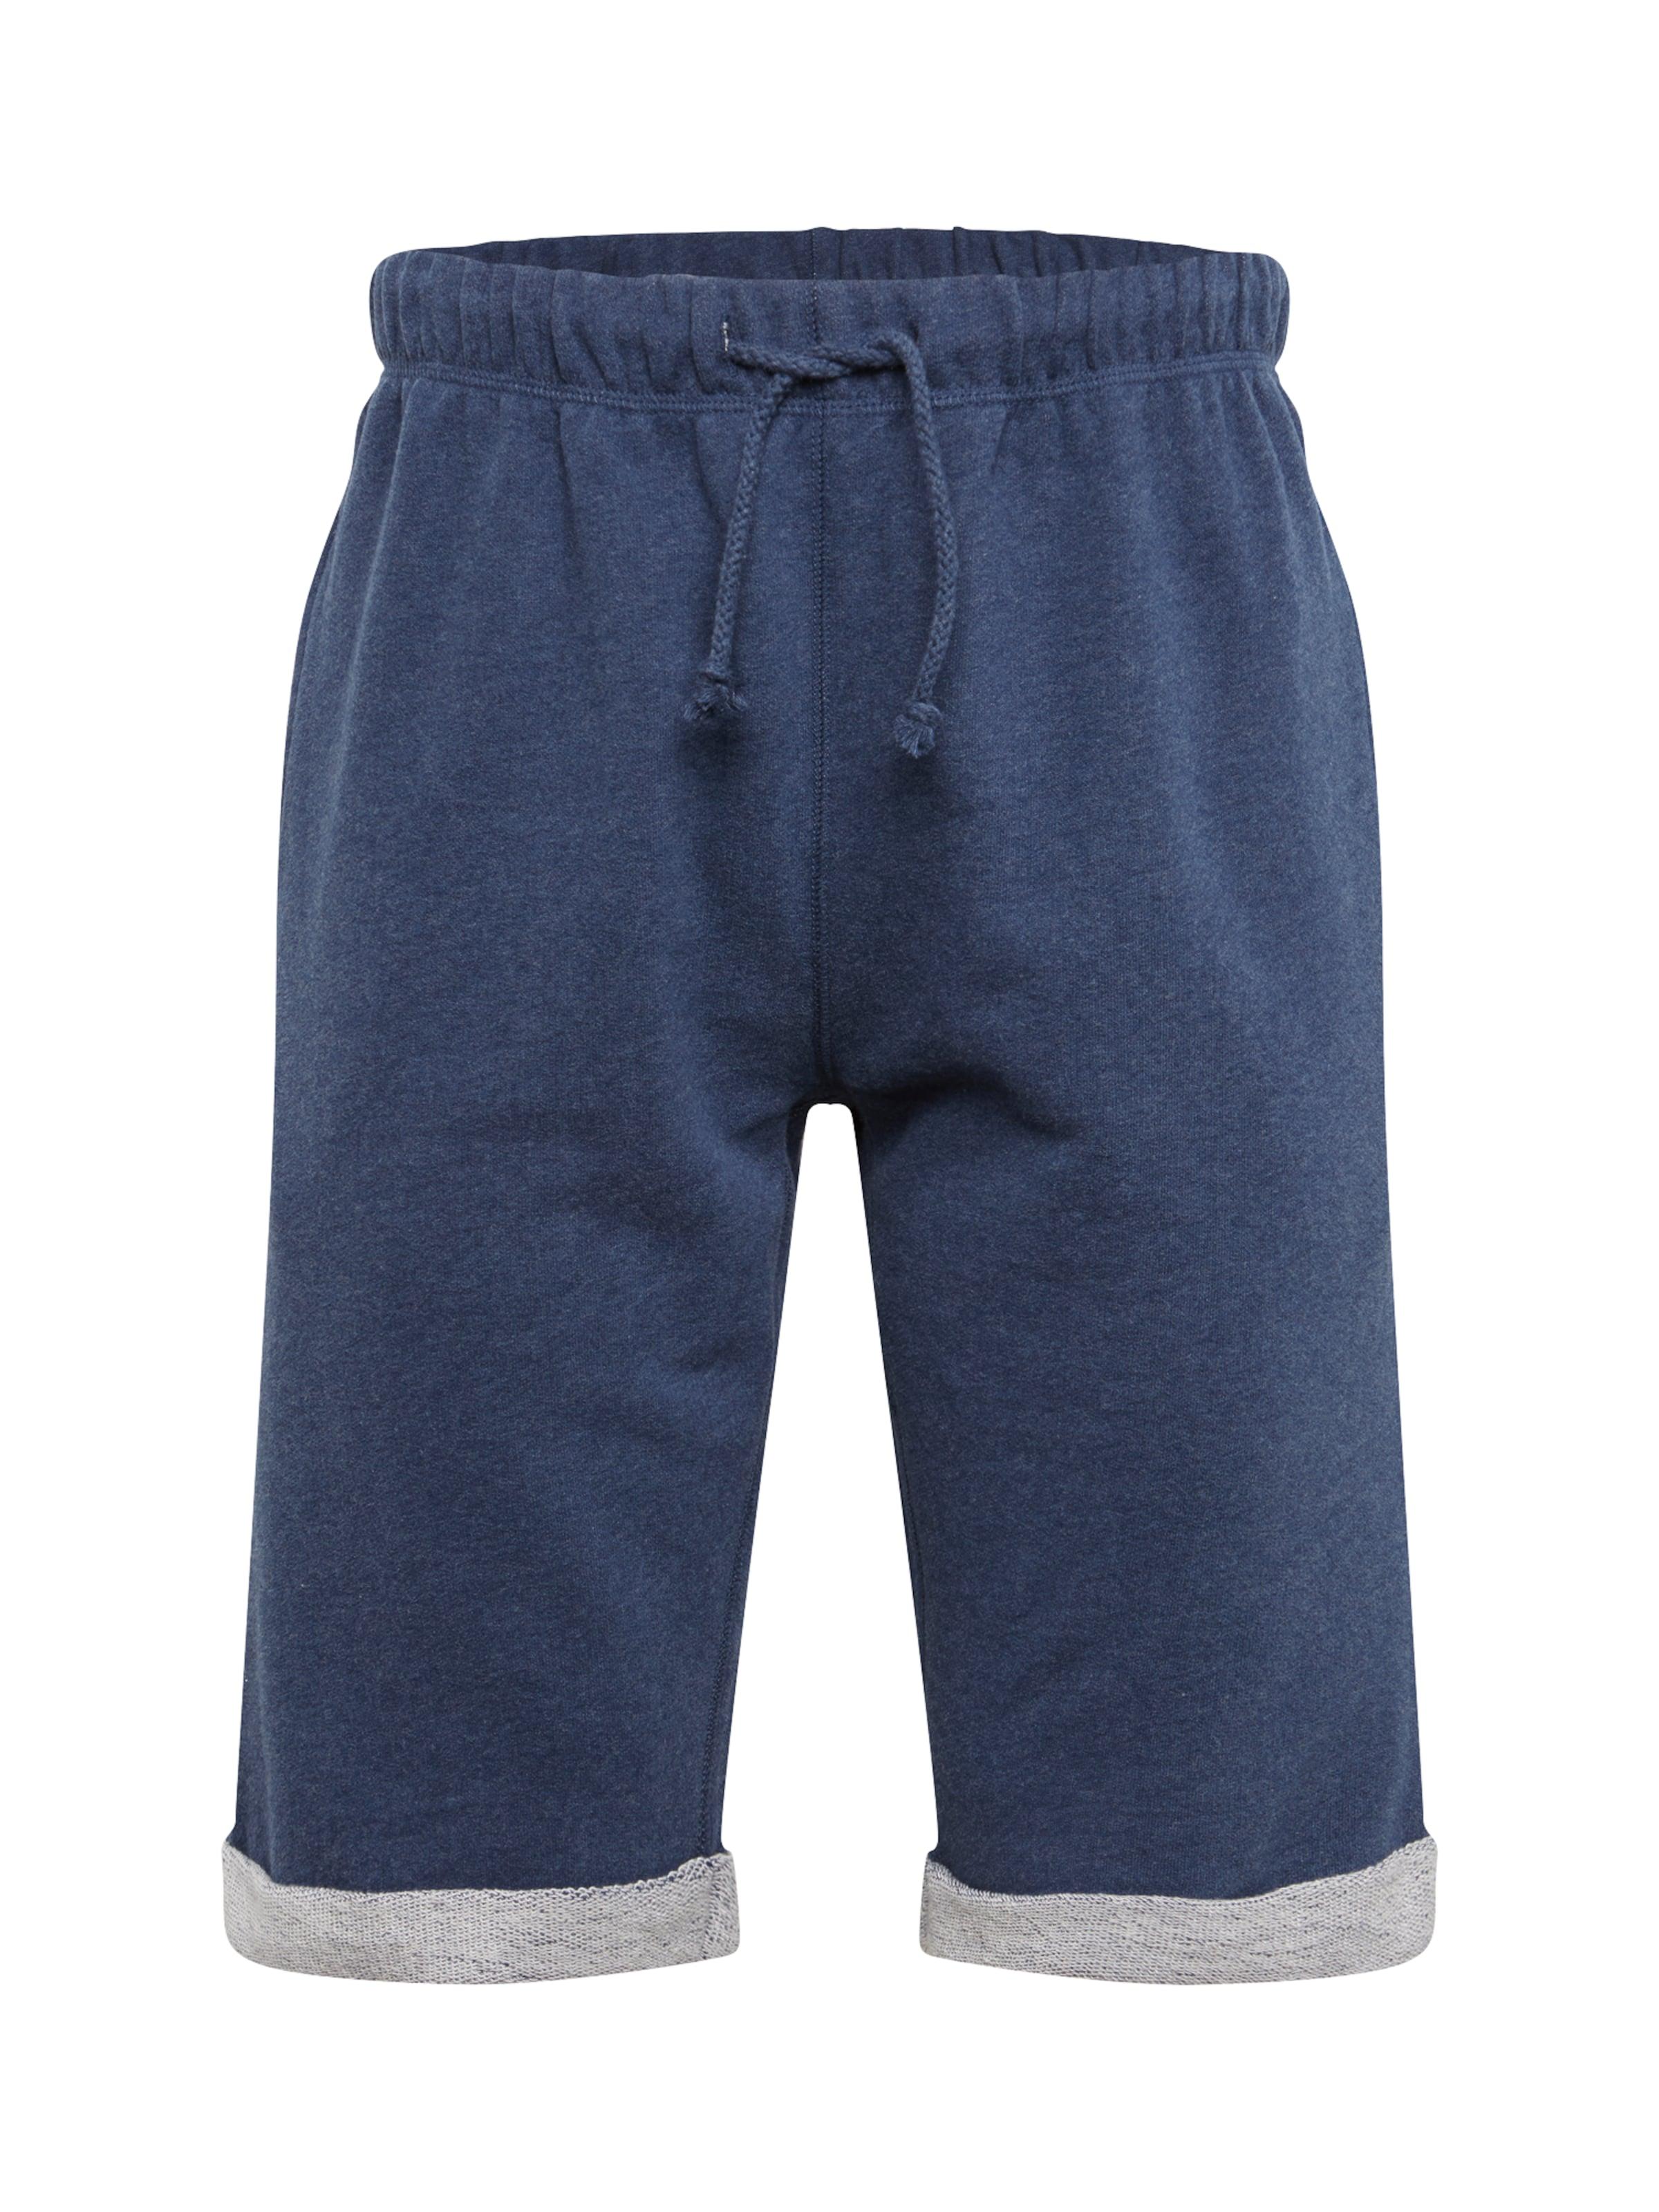 Apparel Apparel Bleu Knowledgecotton En Knowledgecotton Pantalon En Pantalon bfgYy76